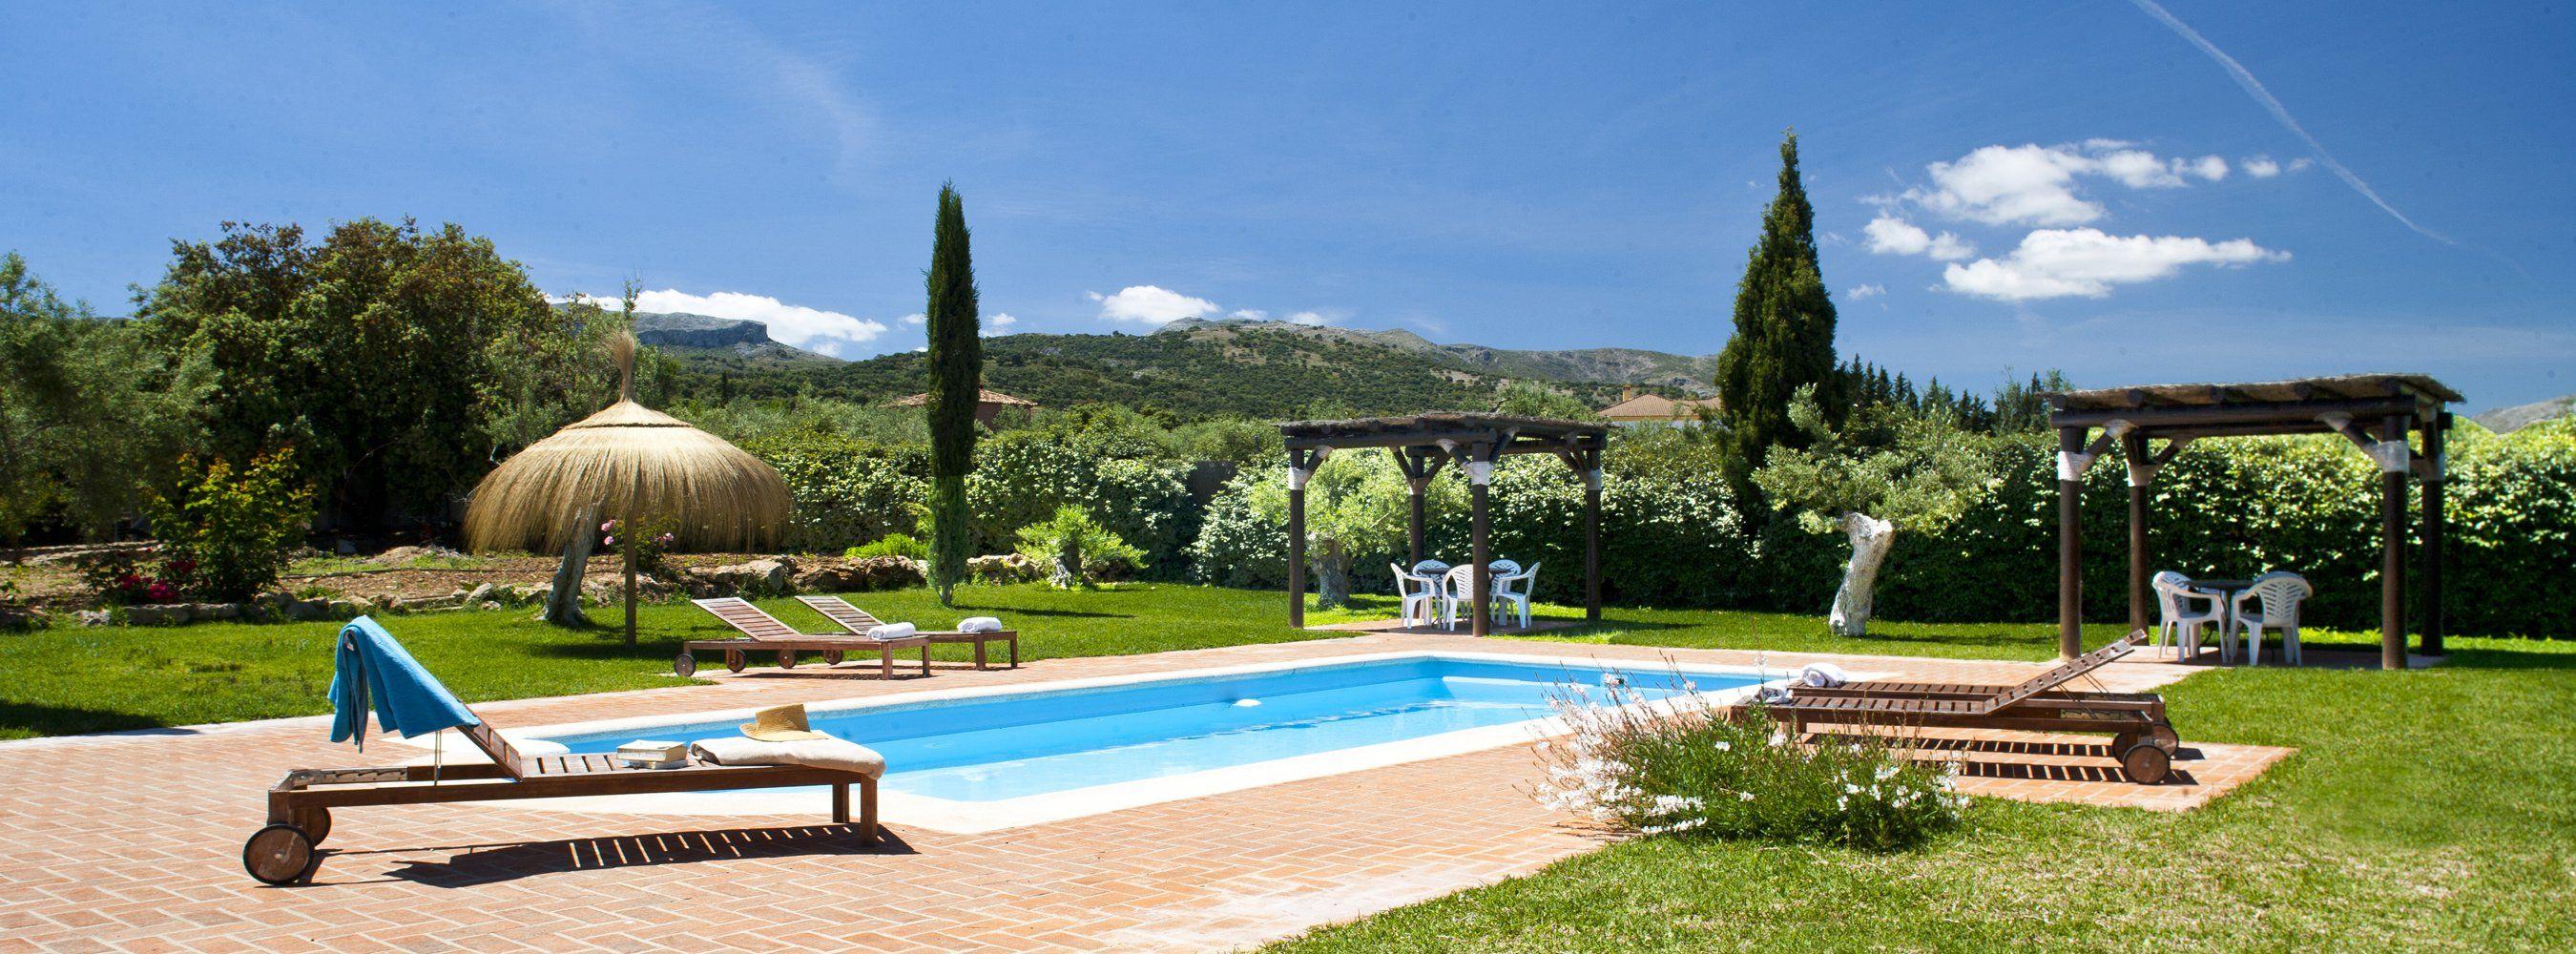 pool and view ronda